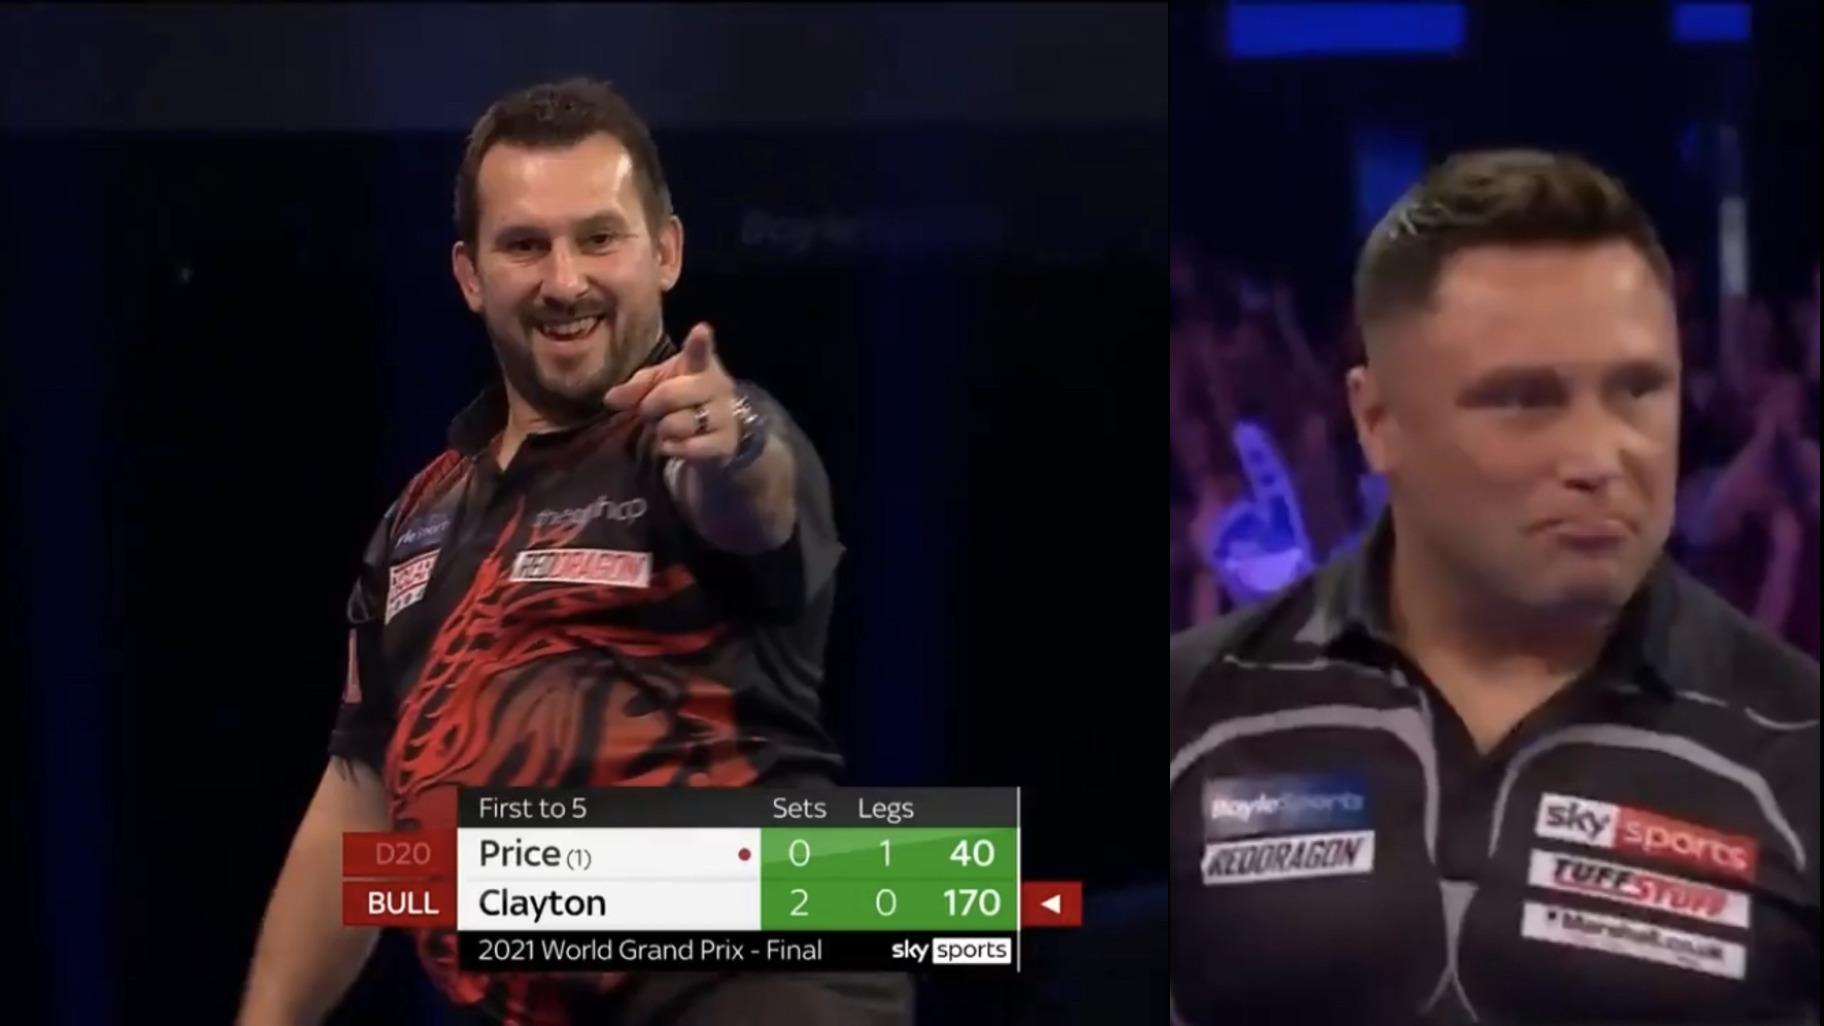 VIDEO: Bizarre 3rd Set Won By Clayton Despite Gerwyn Price 115+ Average